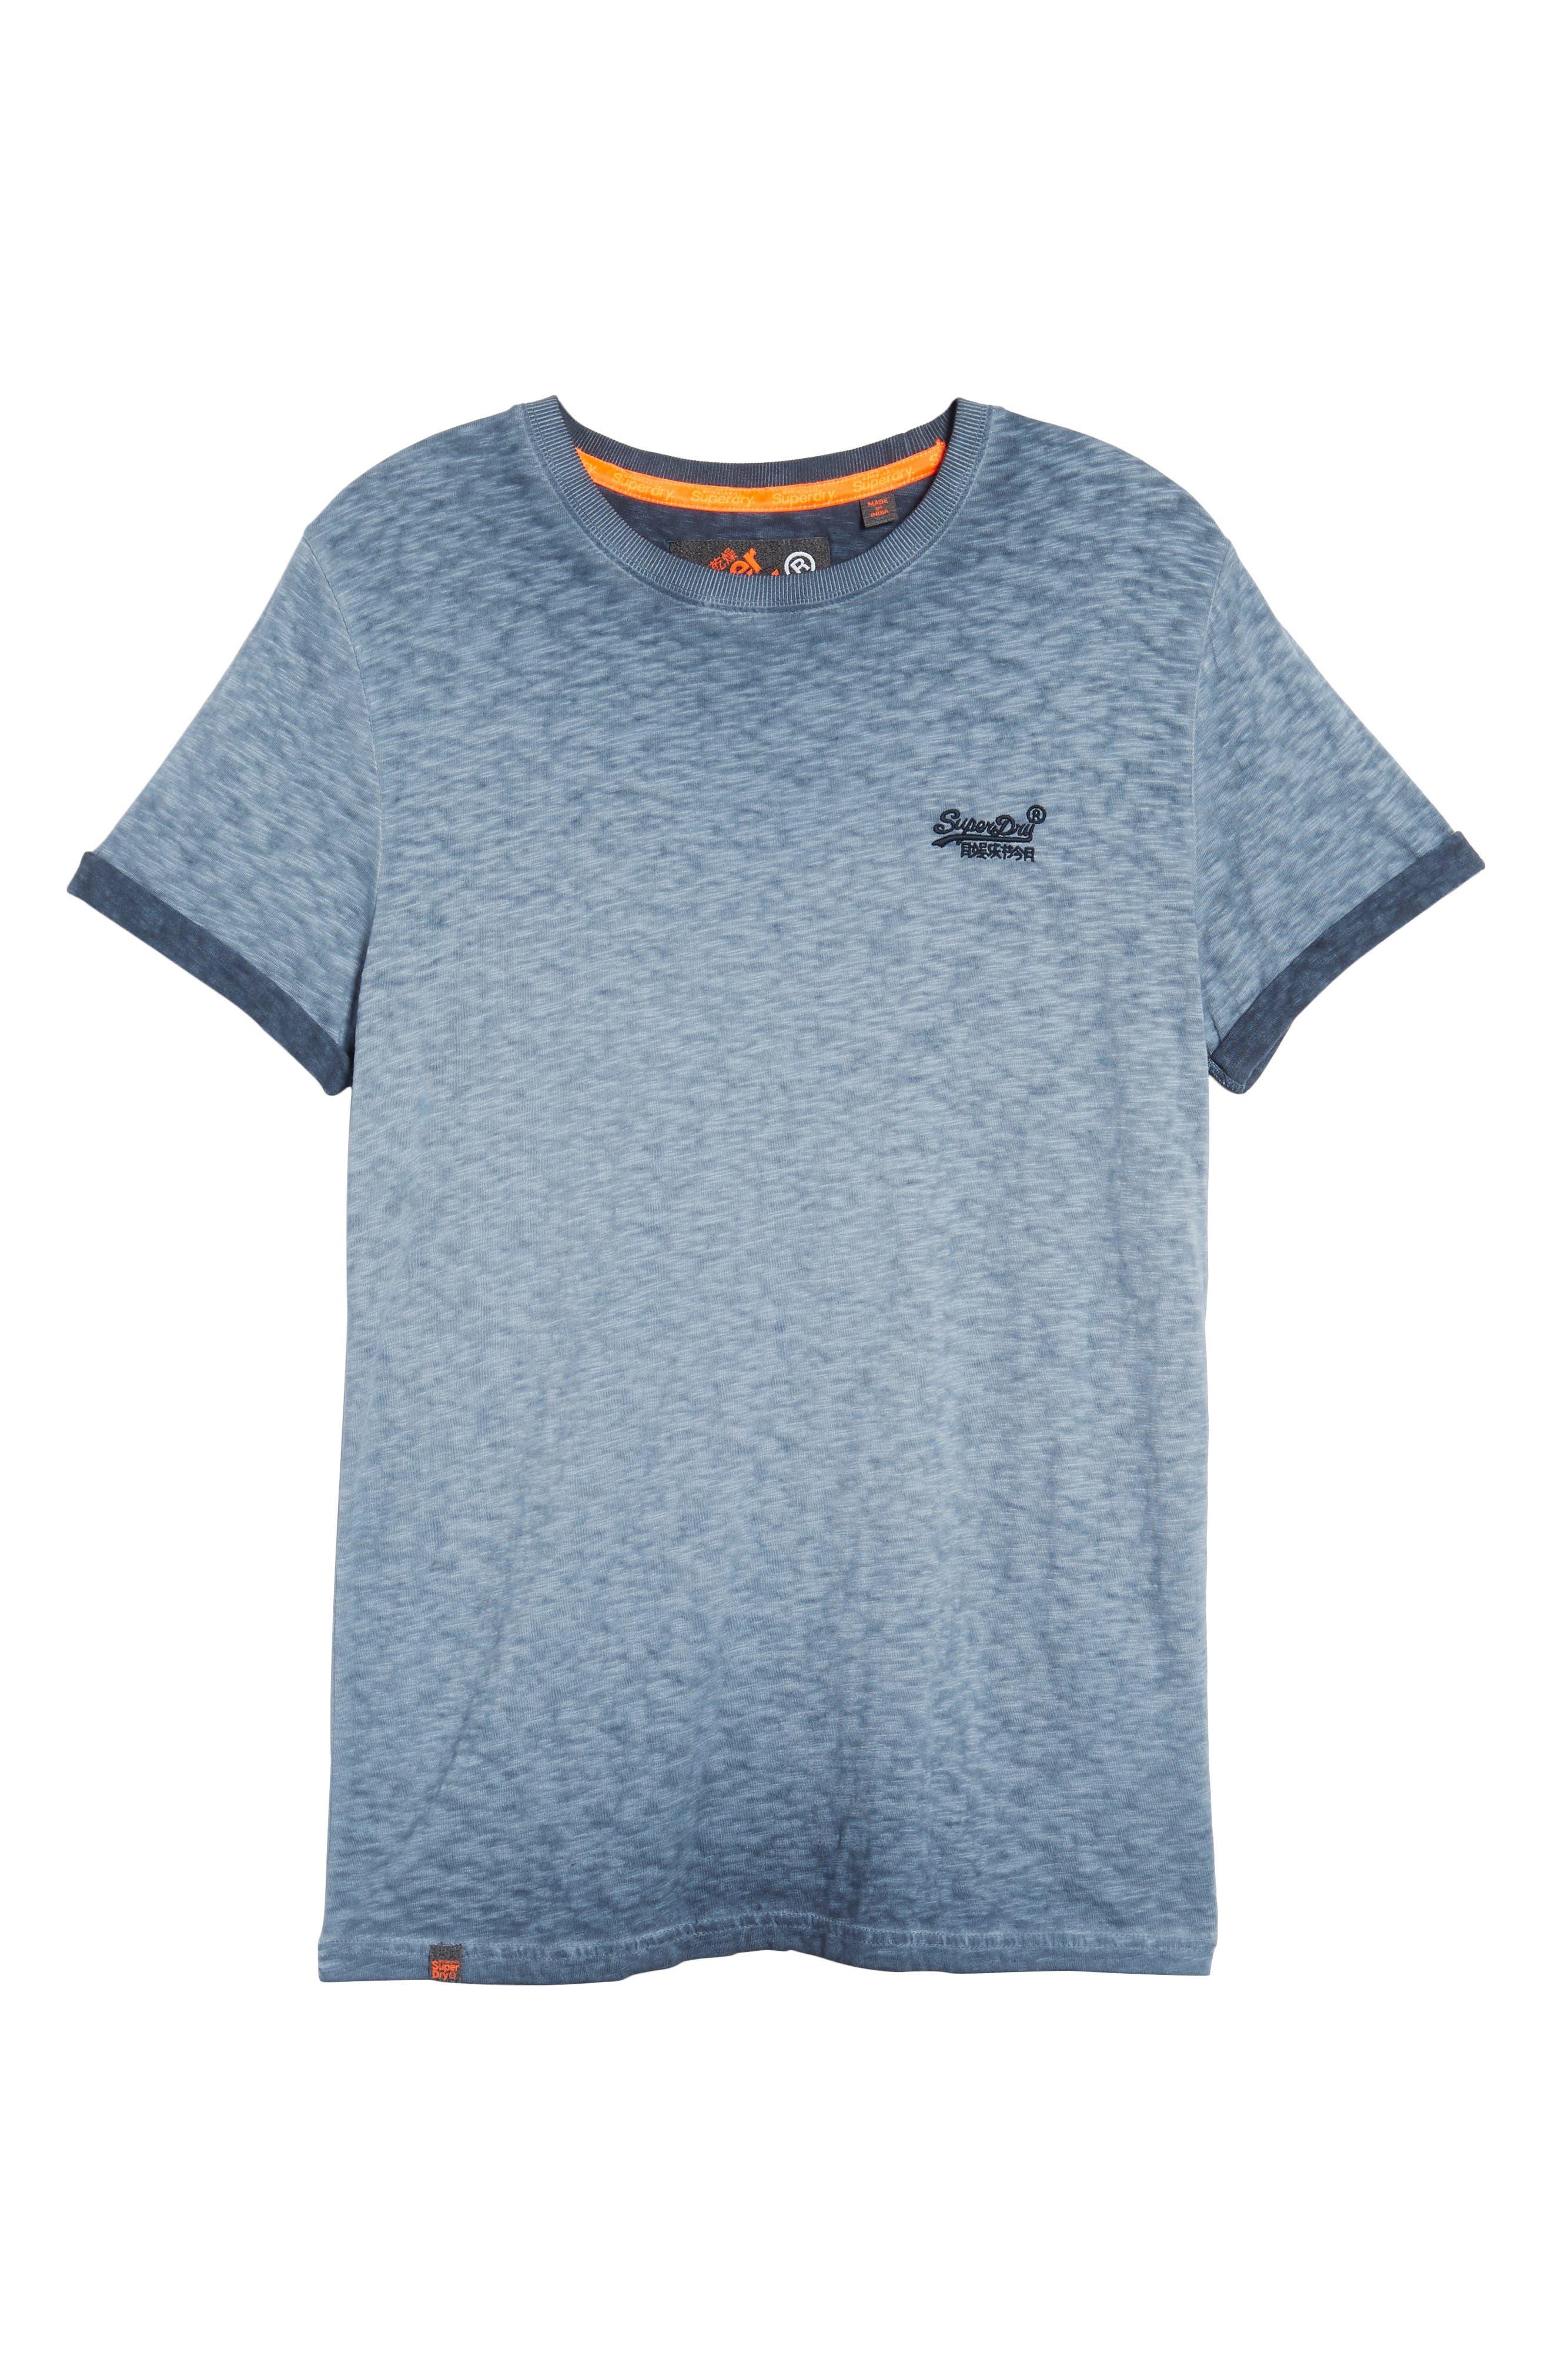 Orange Label Low Roller T-Shirt,                             Alternate thumbnail 27, color,